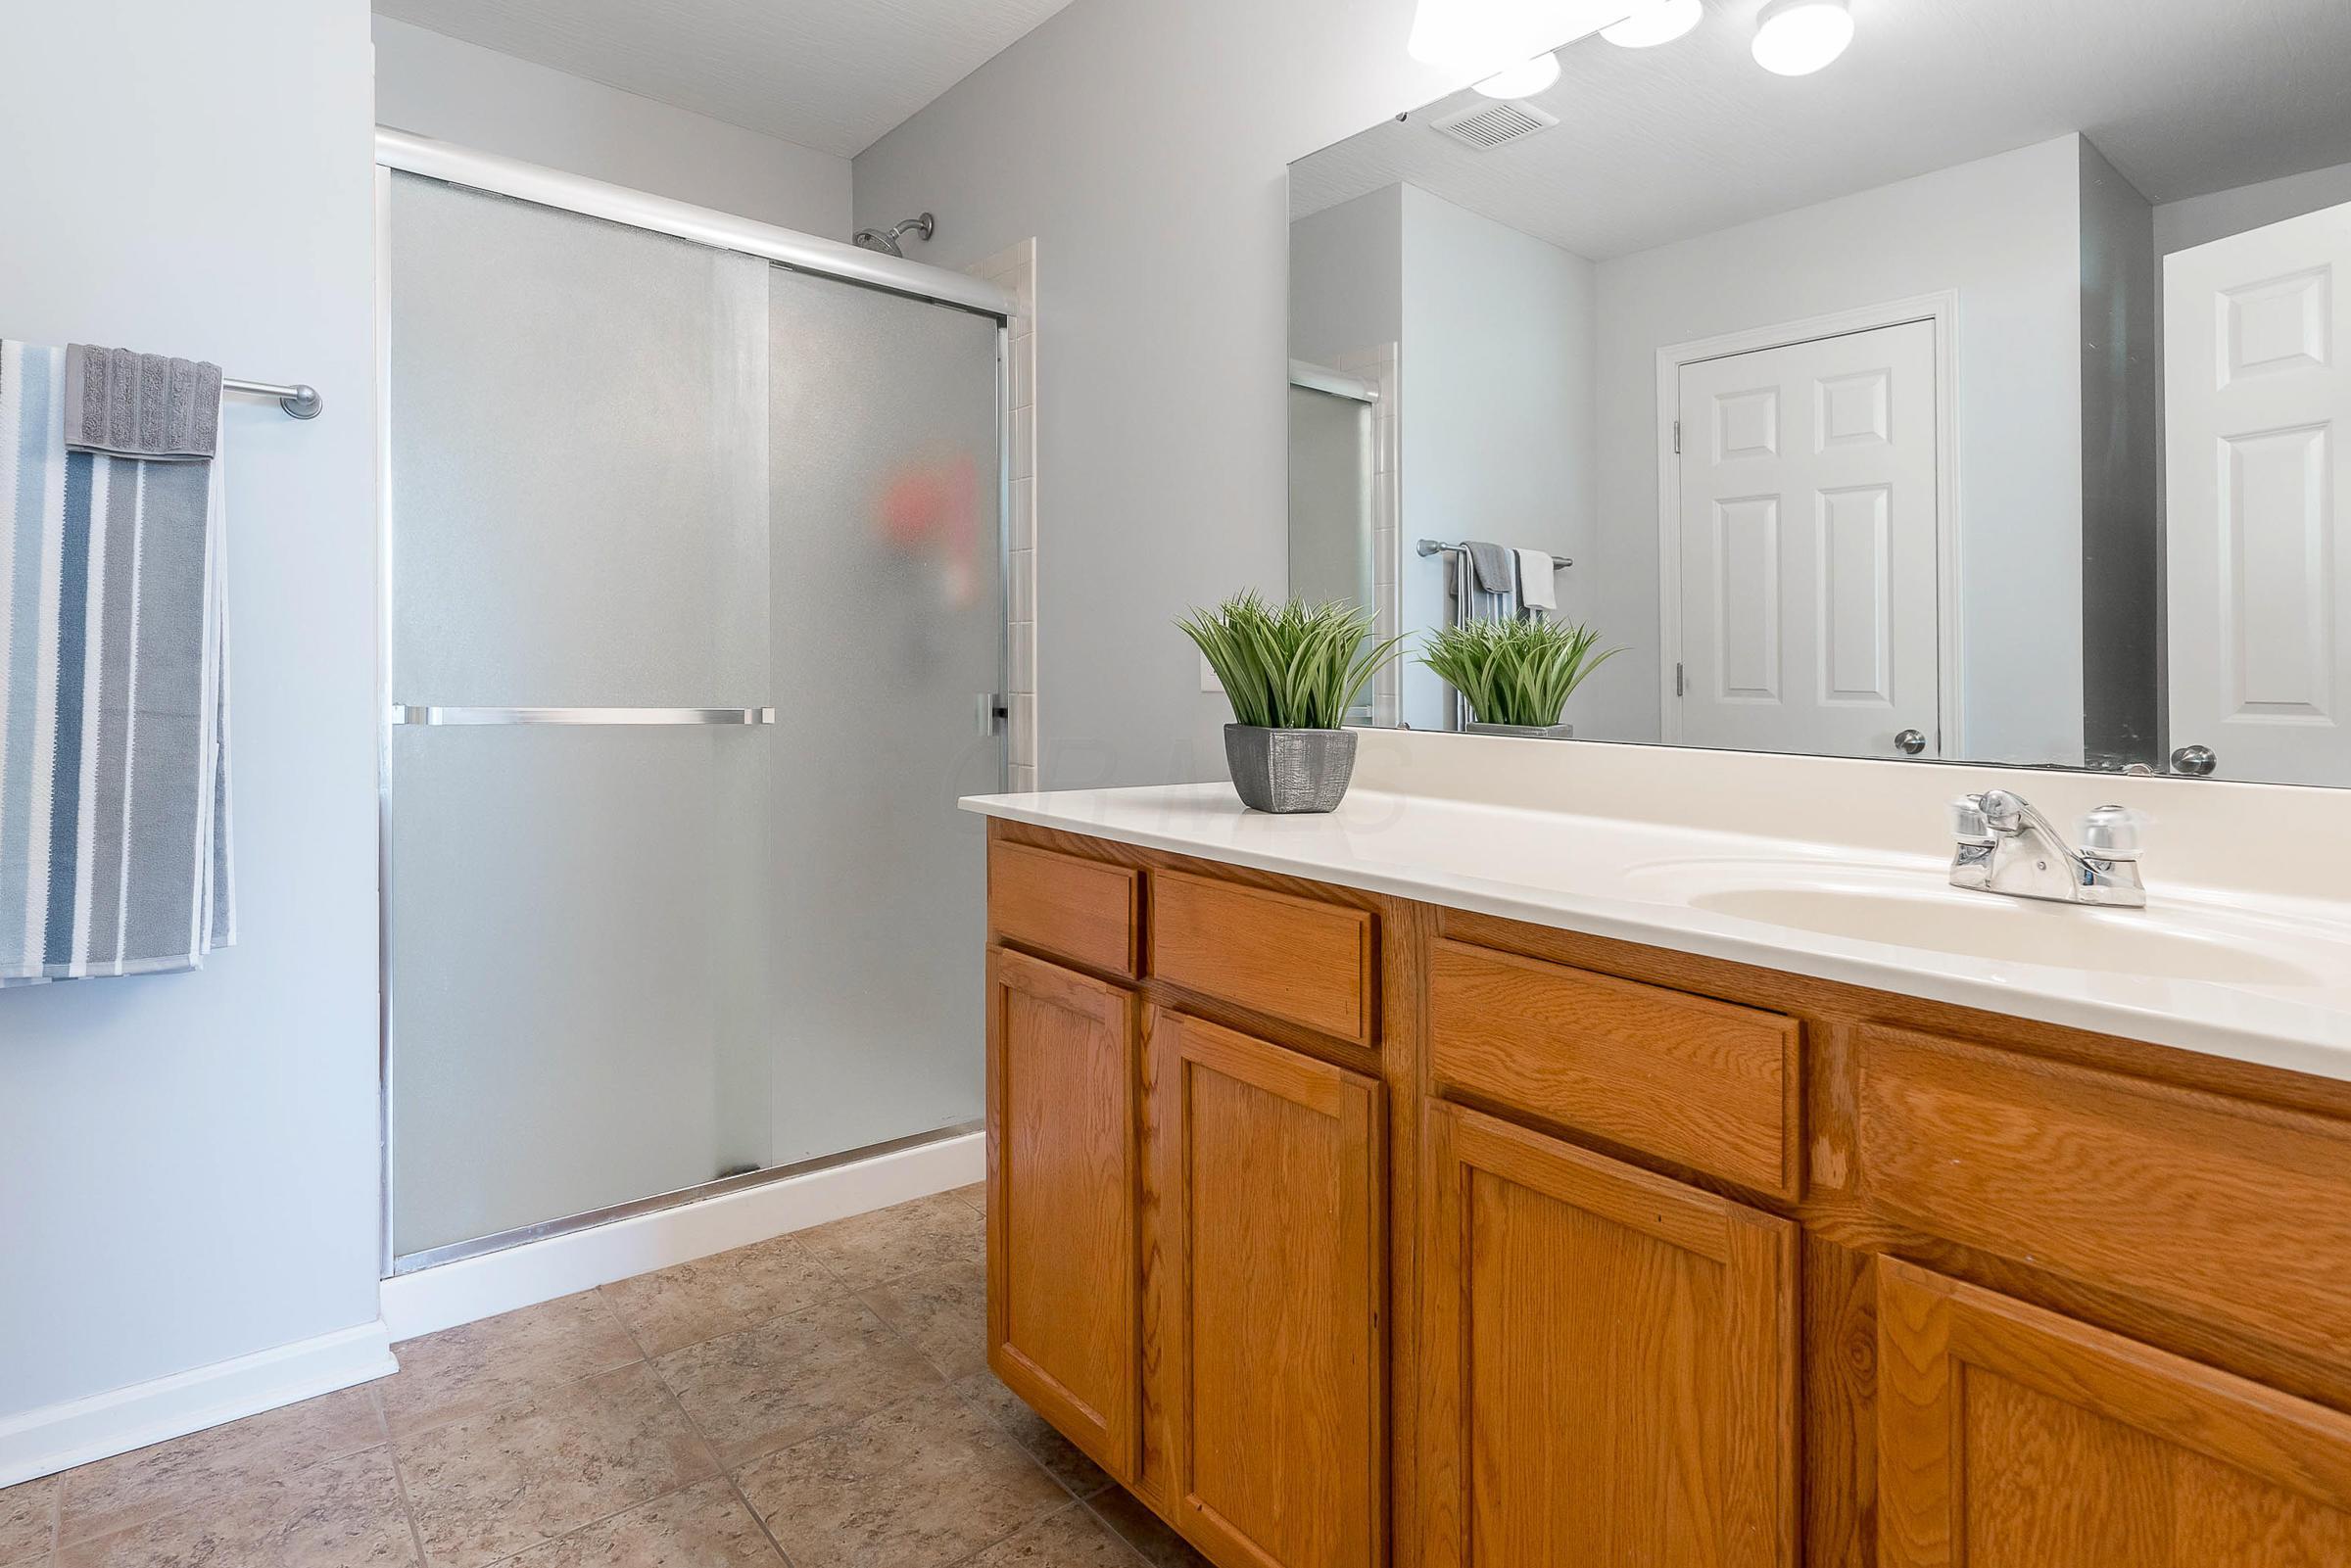 5491 Lehman Meadows Drive, Canal Winchester, Ohio 43110, 3 Bedrooms Bedrooms, ,3 BathroomsBathrooms,Residential,For Sale,Lehman Meadows,220040827